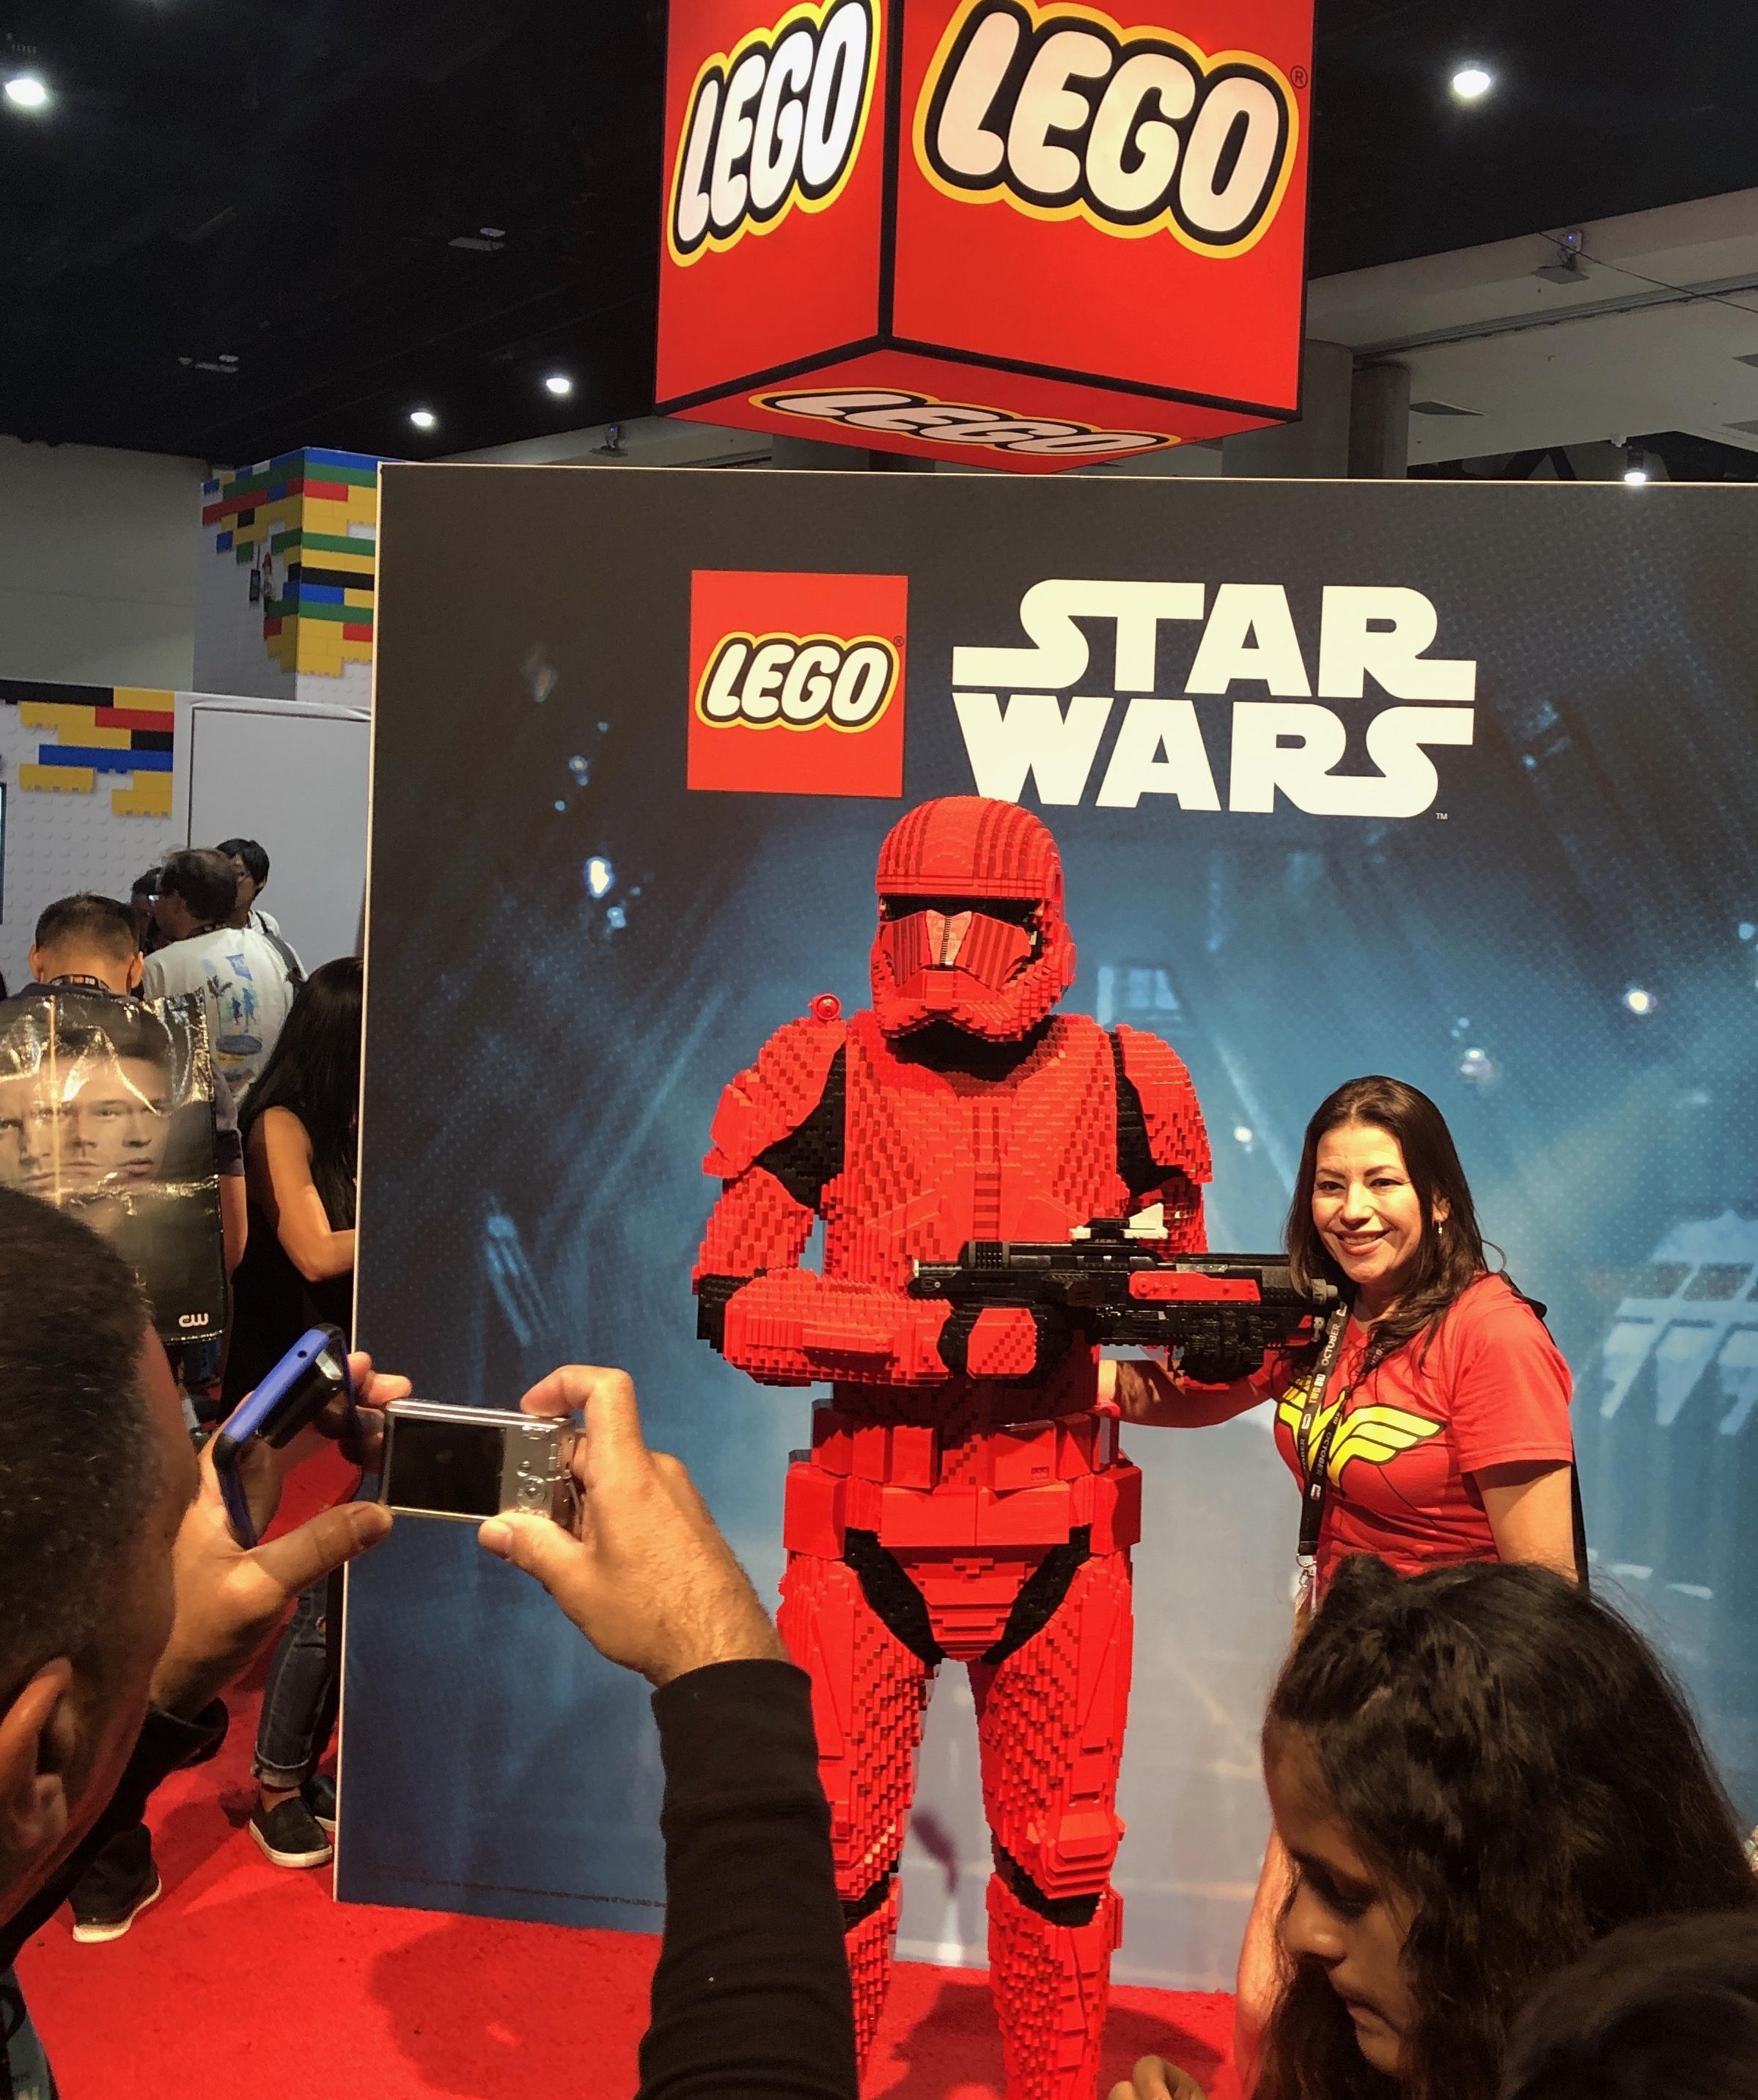 Lego x Star Wars at ComicCon 2019